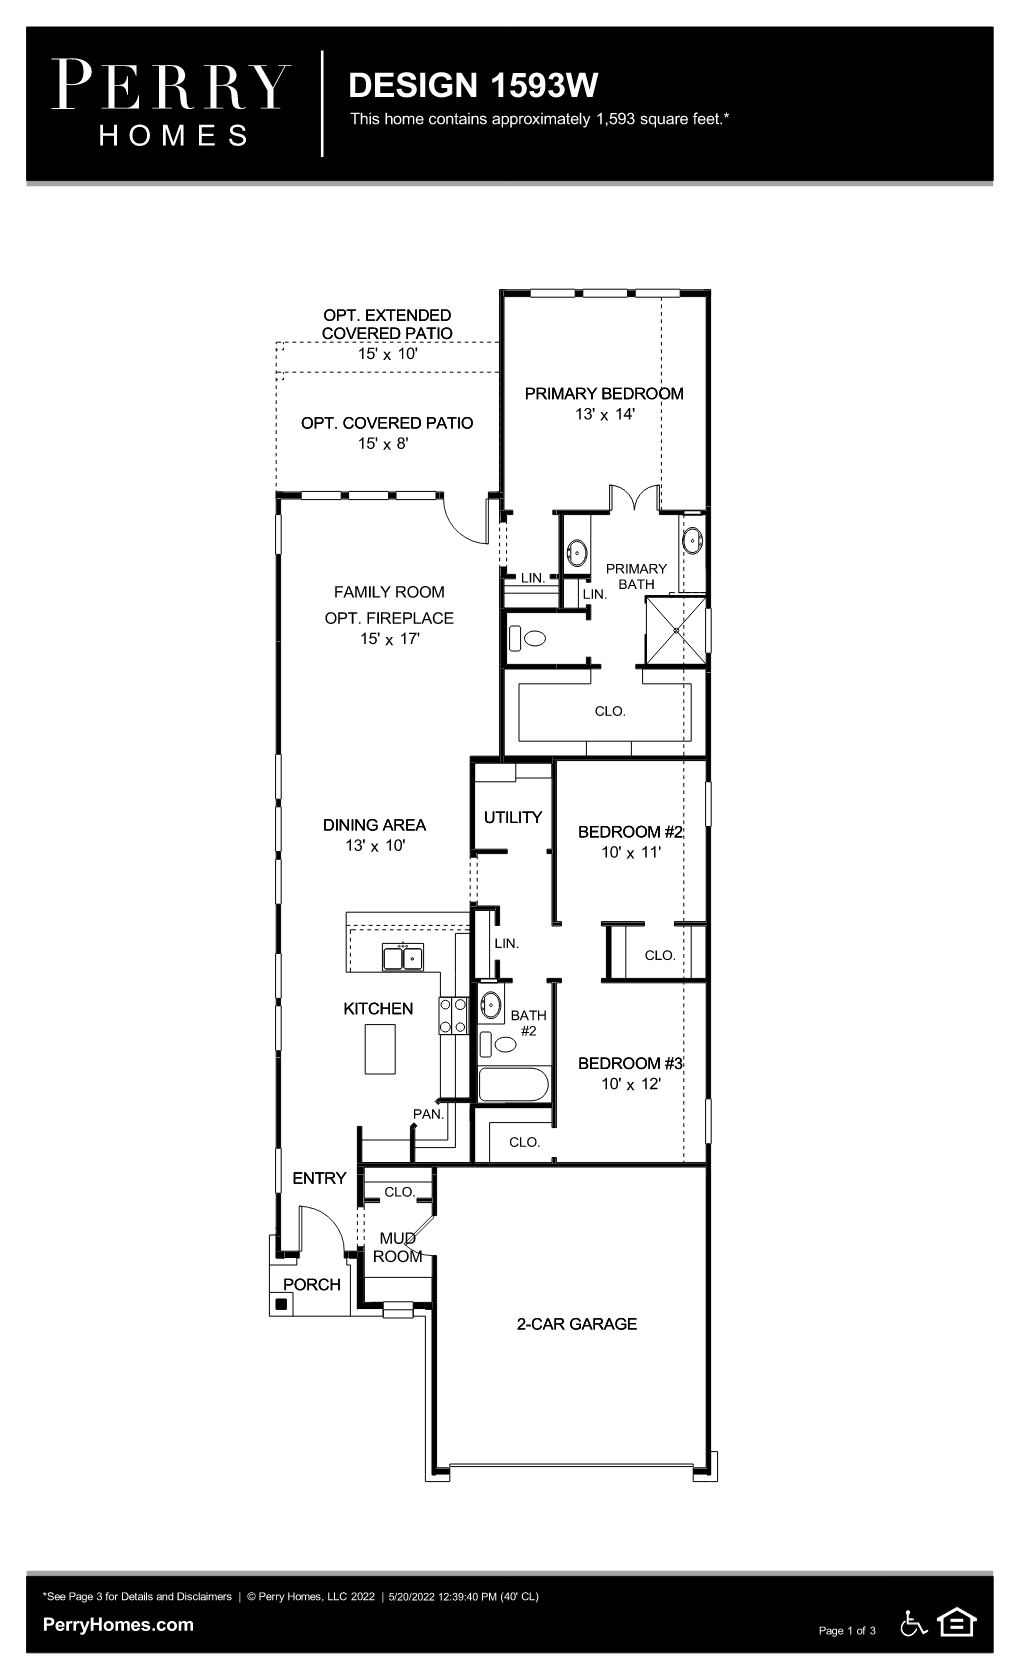 Floor Plan for 1593W